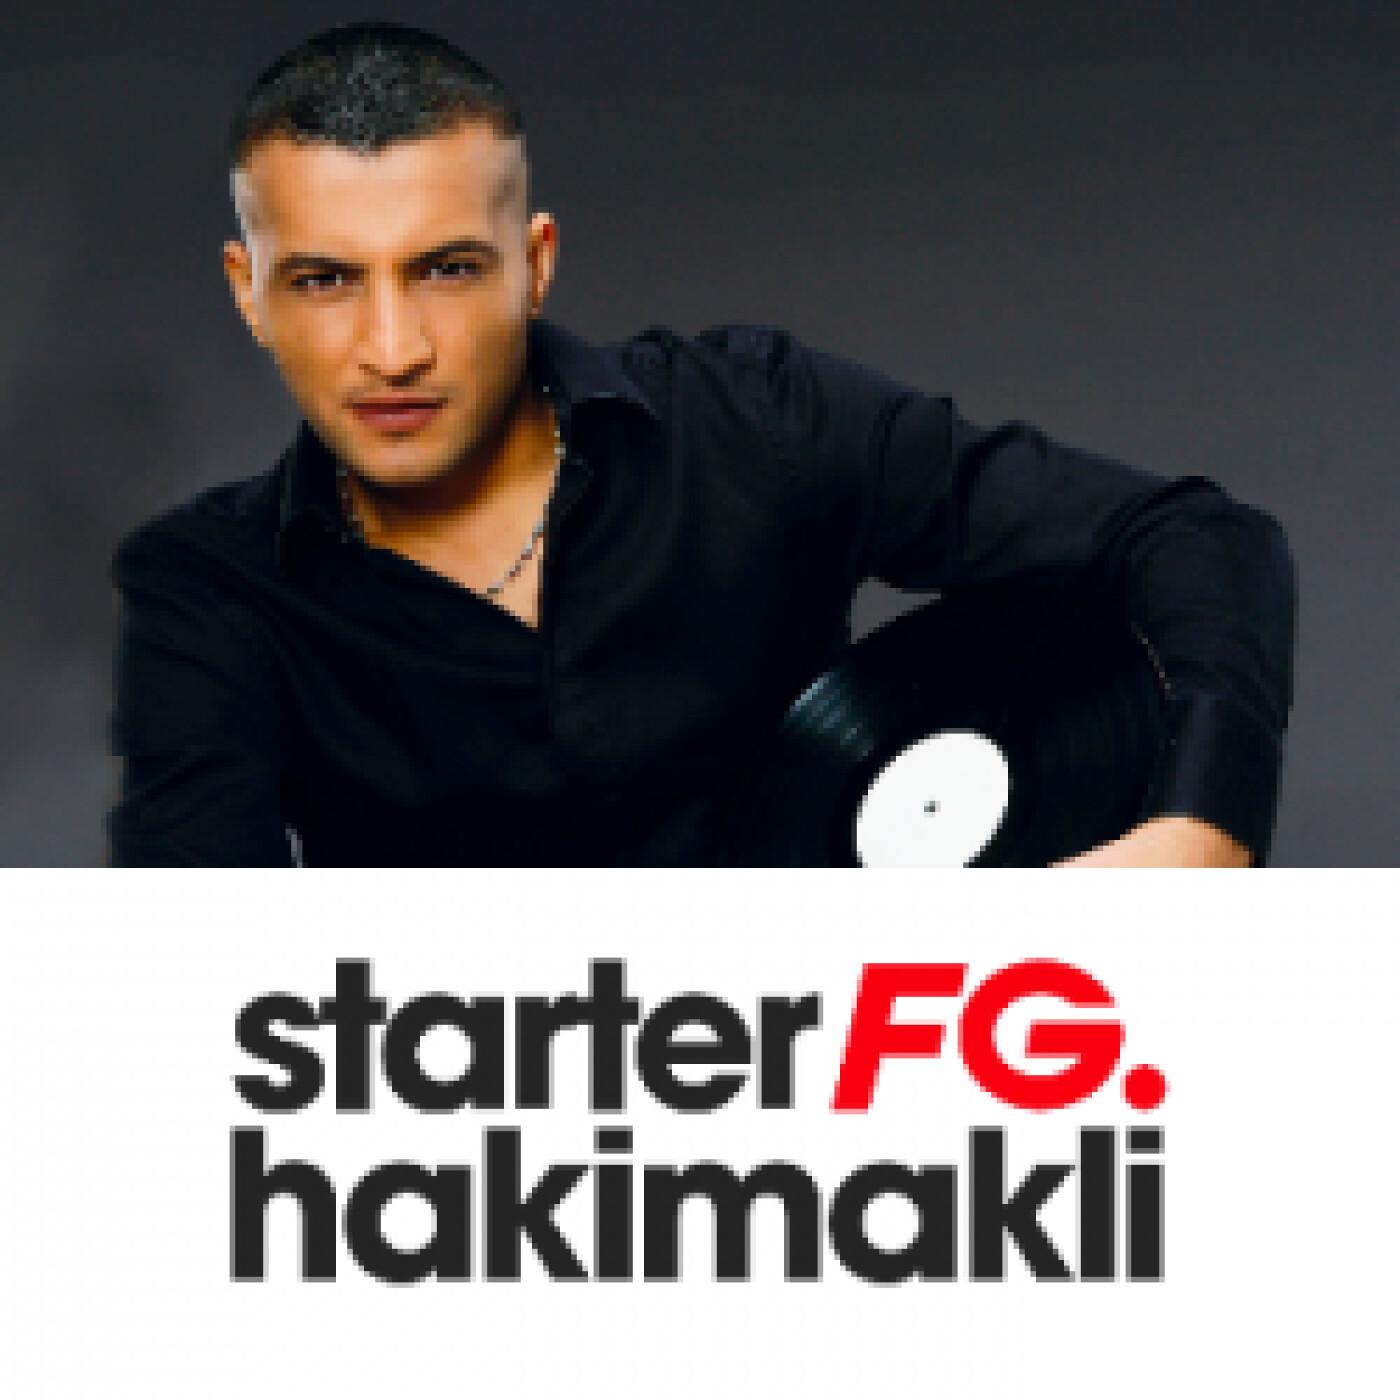 STARTER FG BY HAKIMAKLI MERCREDI 16 JUIN 2021